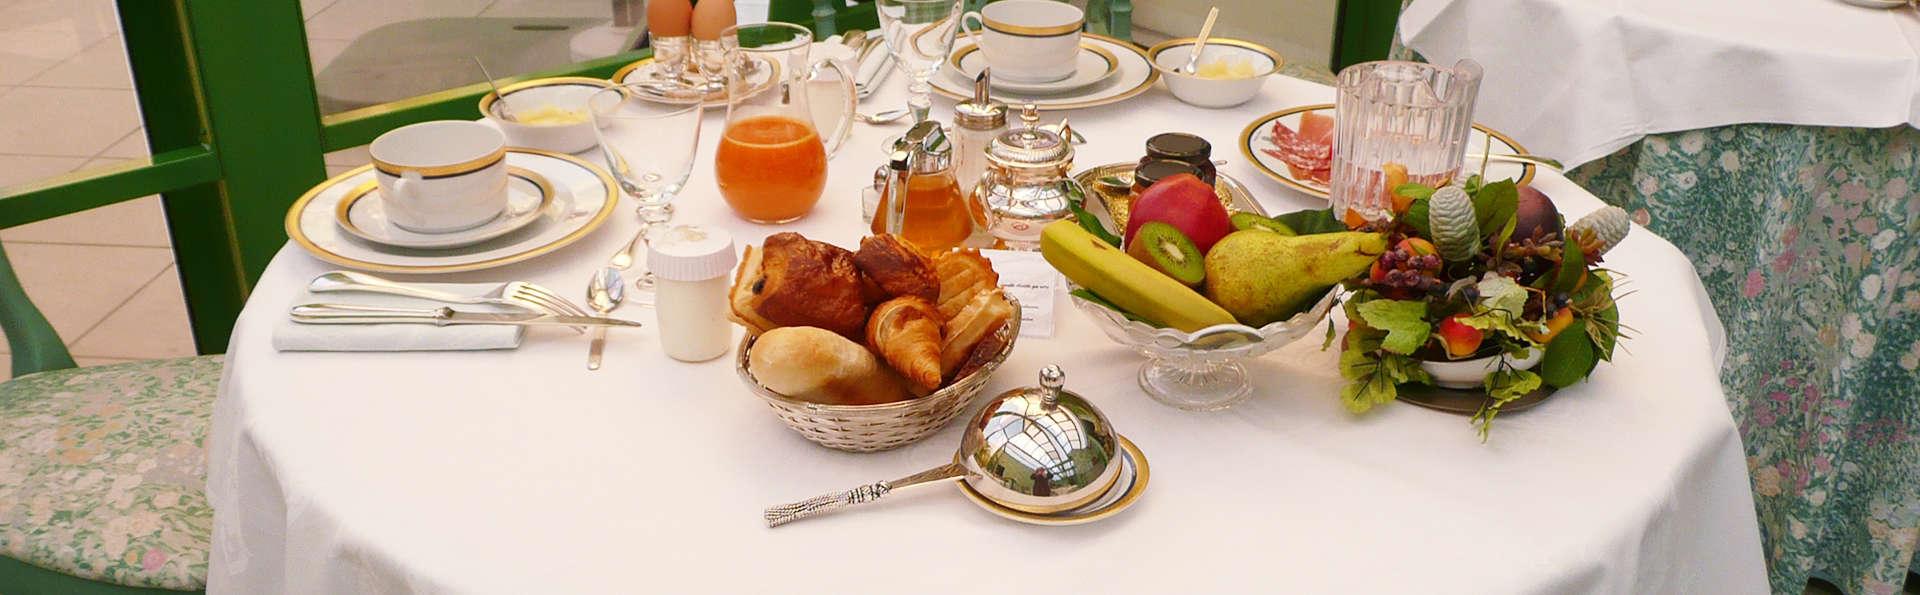 Grand Hôtel des Templiers - EDIT_breakfast.jpg